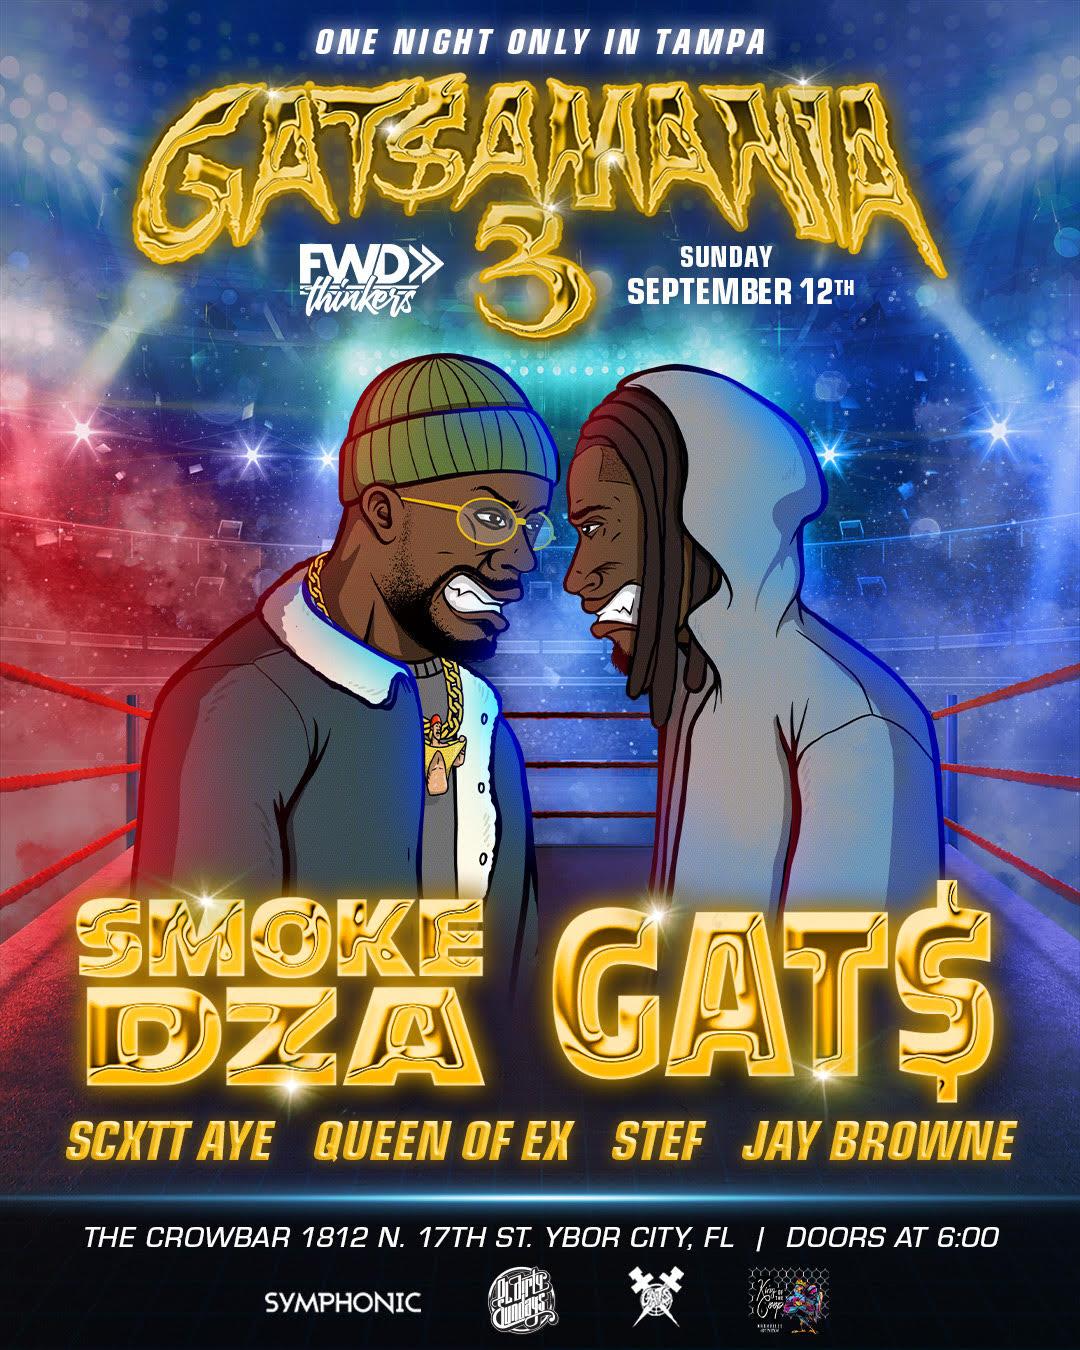 Gats-SmokeDZA-Gatsmania-Crowbar-Tampa-FWDthinkers-Five5